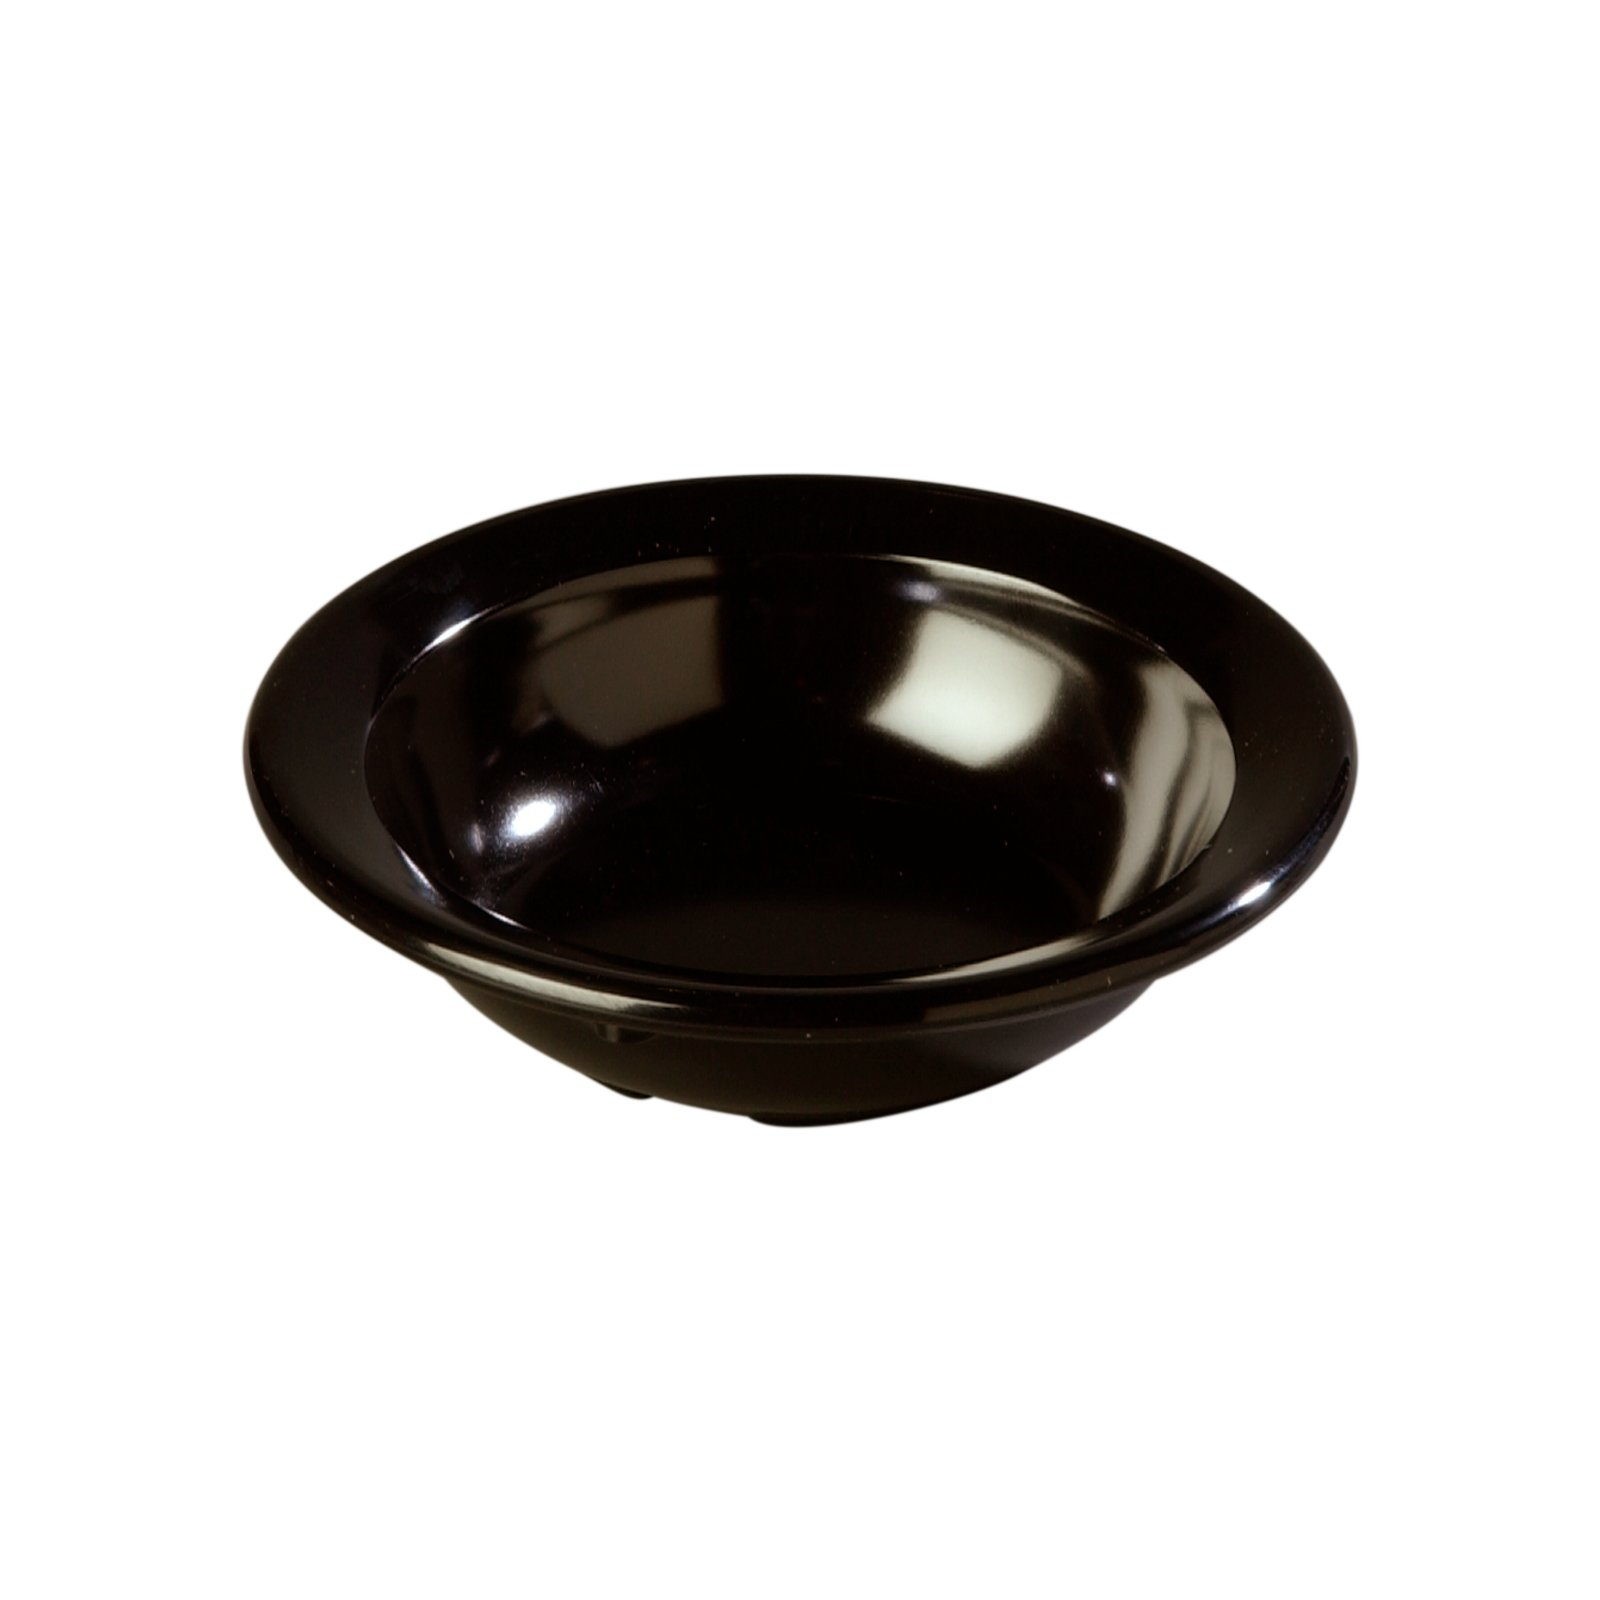 4353203 Dallas Ware Melamine Fruit Bowl 3 5oz Black Carlisle Foodservice Products